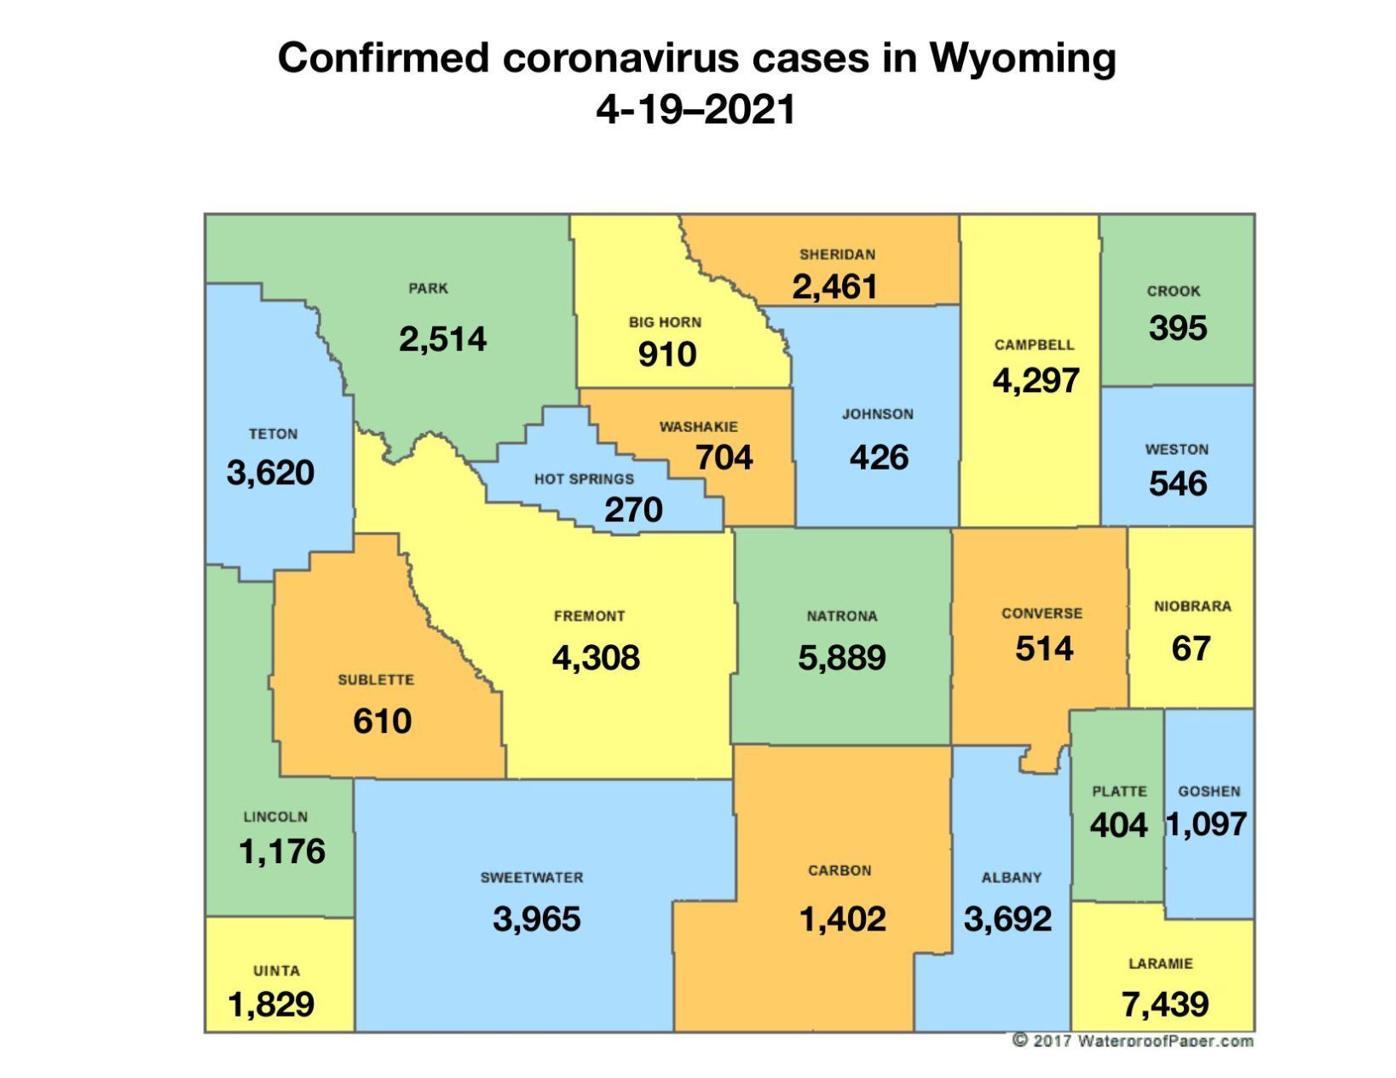 Confirmed coronavirus cases in Wyoming, 4-19-21